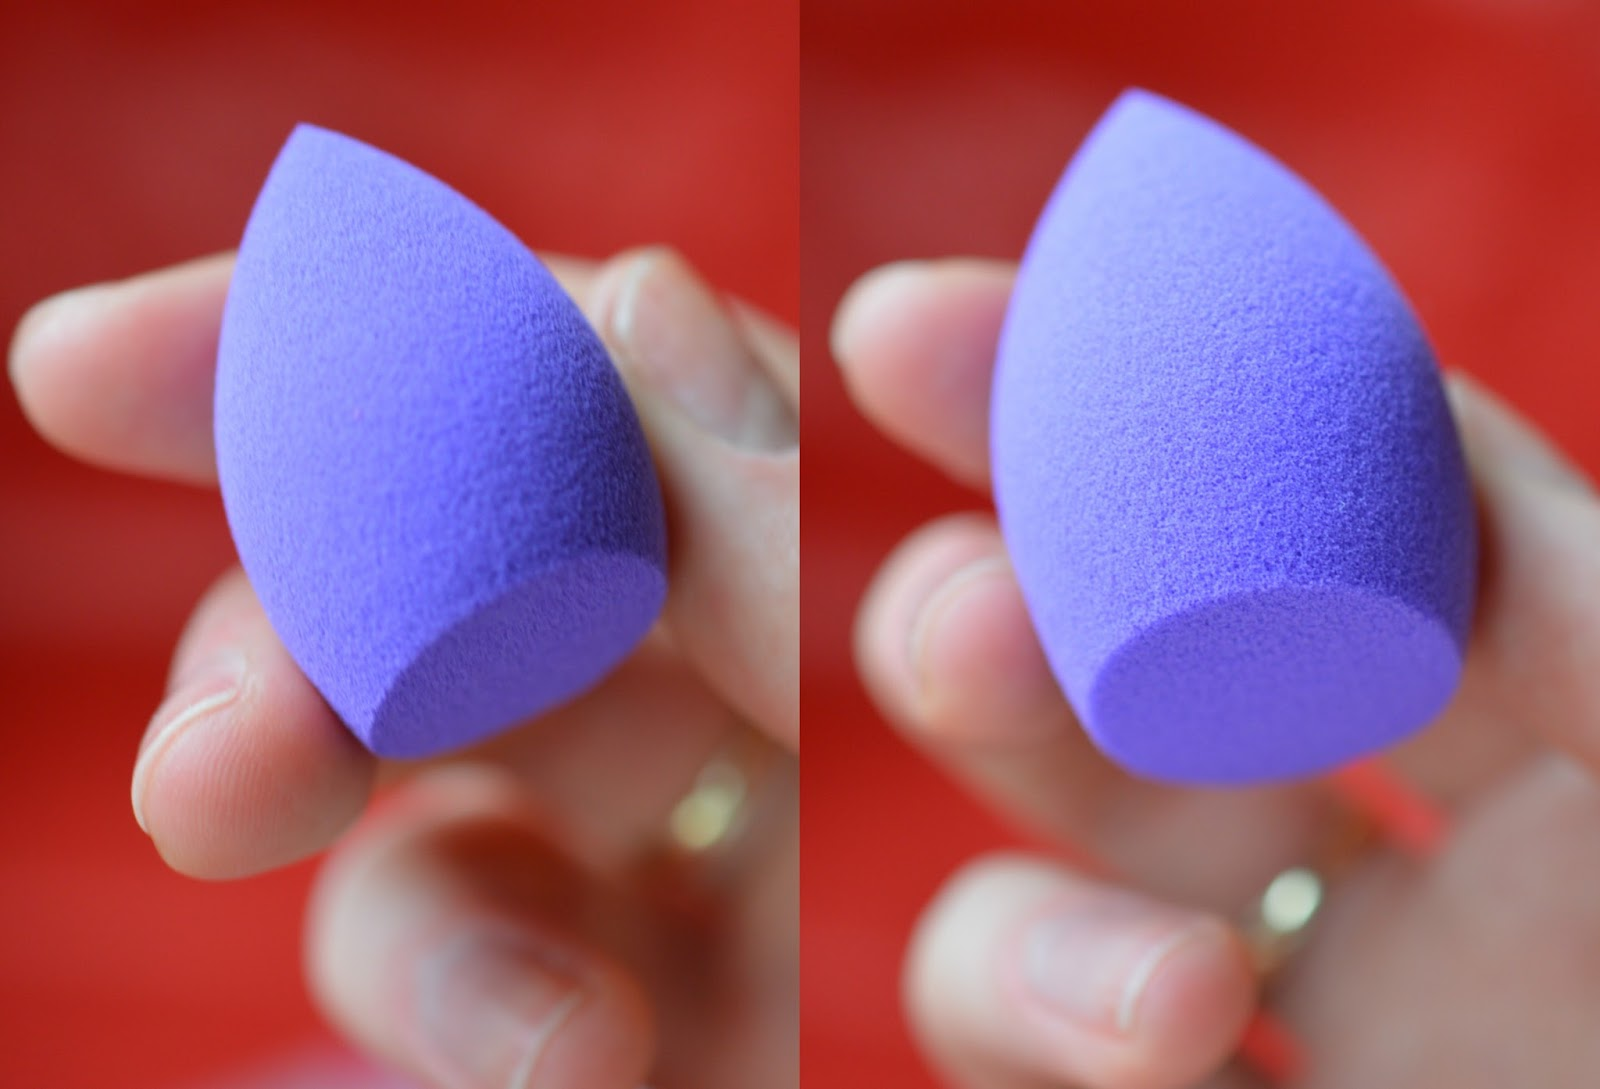 Real Techniques Miracle Mini Complexion Sponges